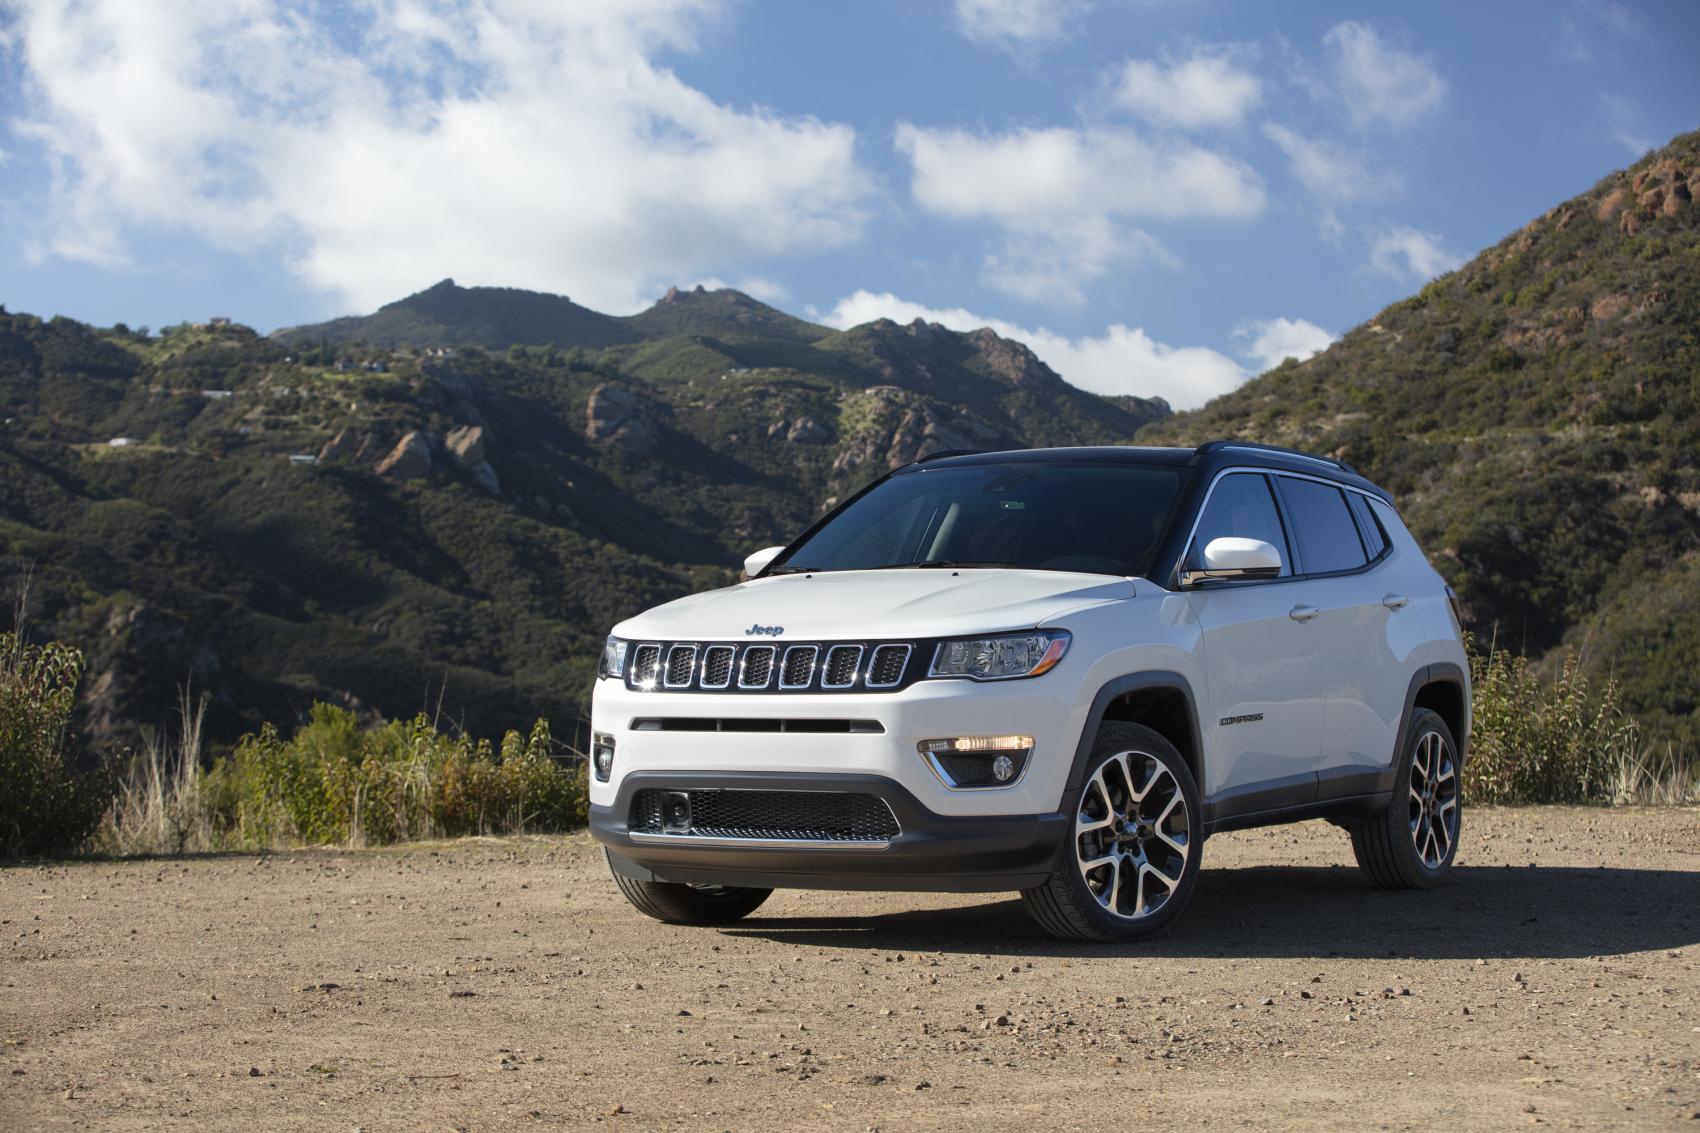 2021 Jeep Compass White Mountains C. Harper CDJR